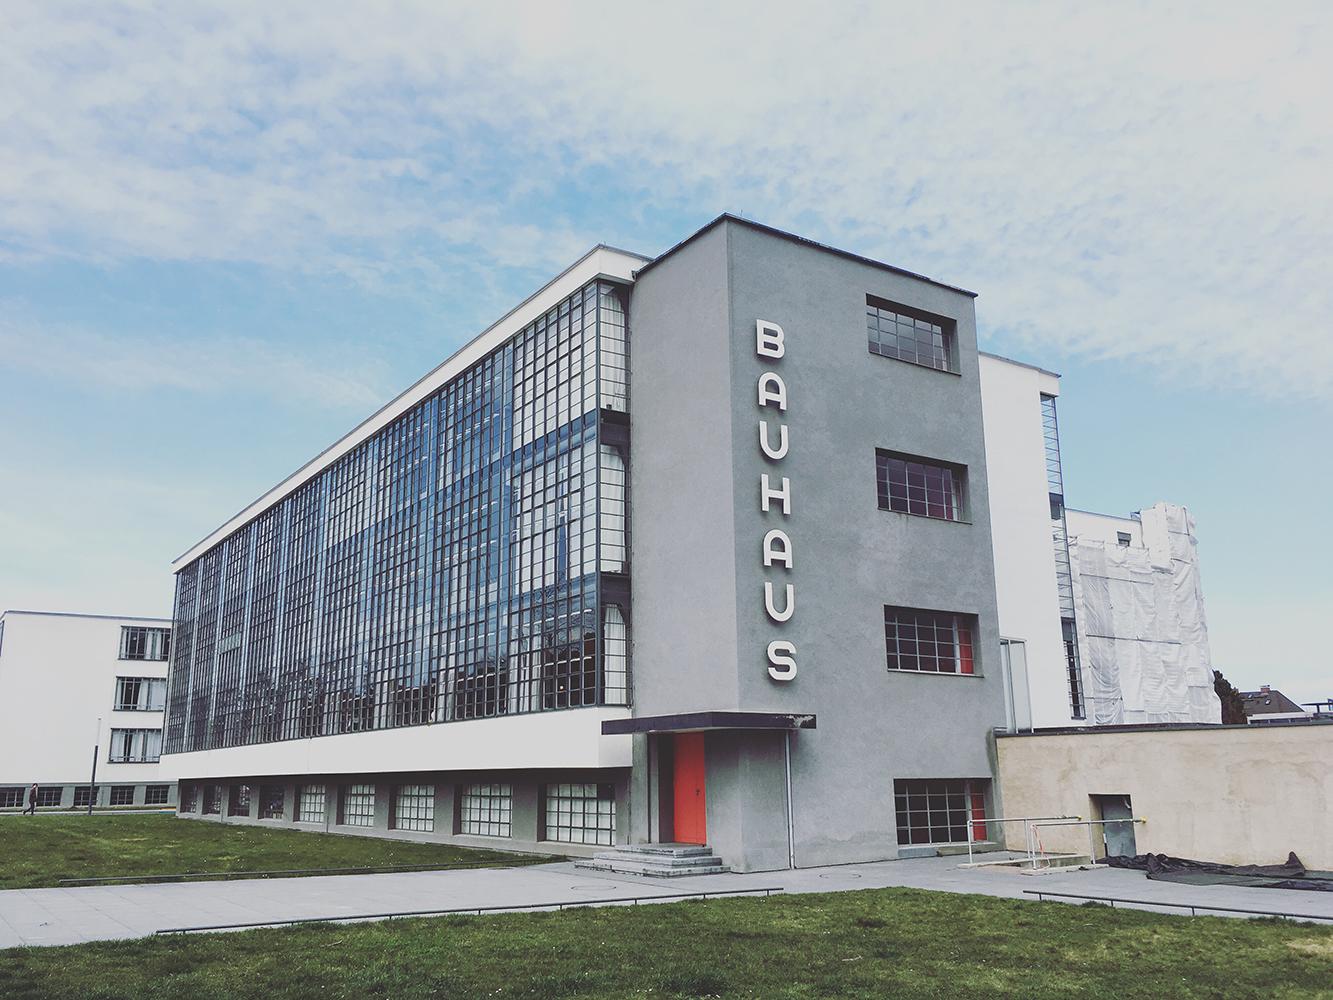 Bauhaus Dessau Visit – Photographic Impressions